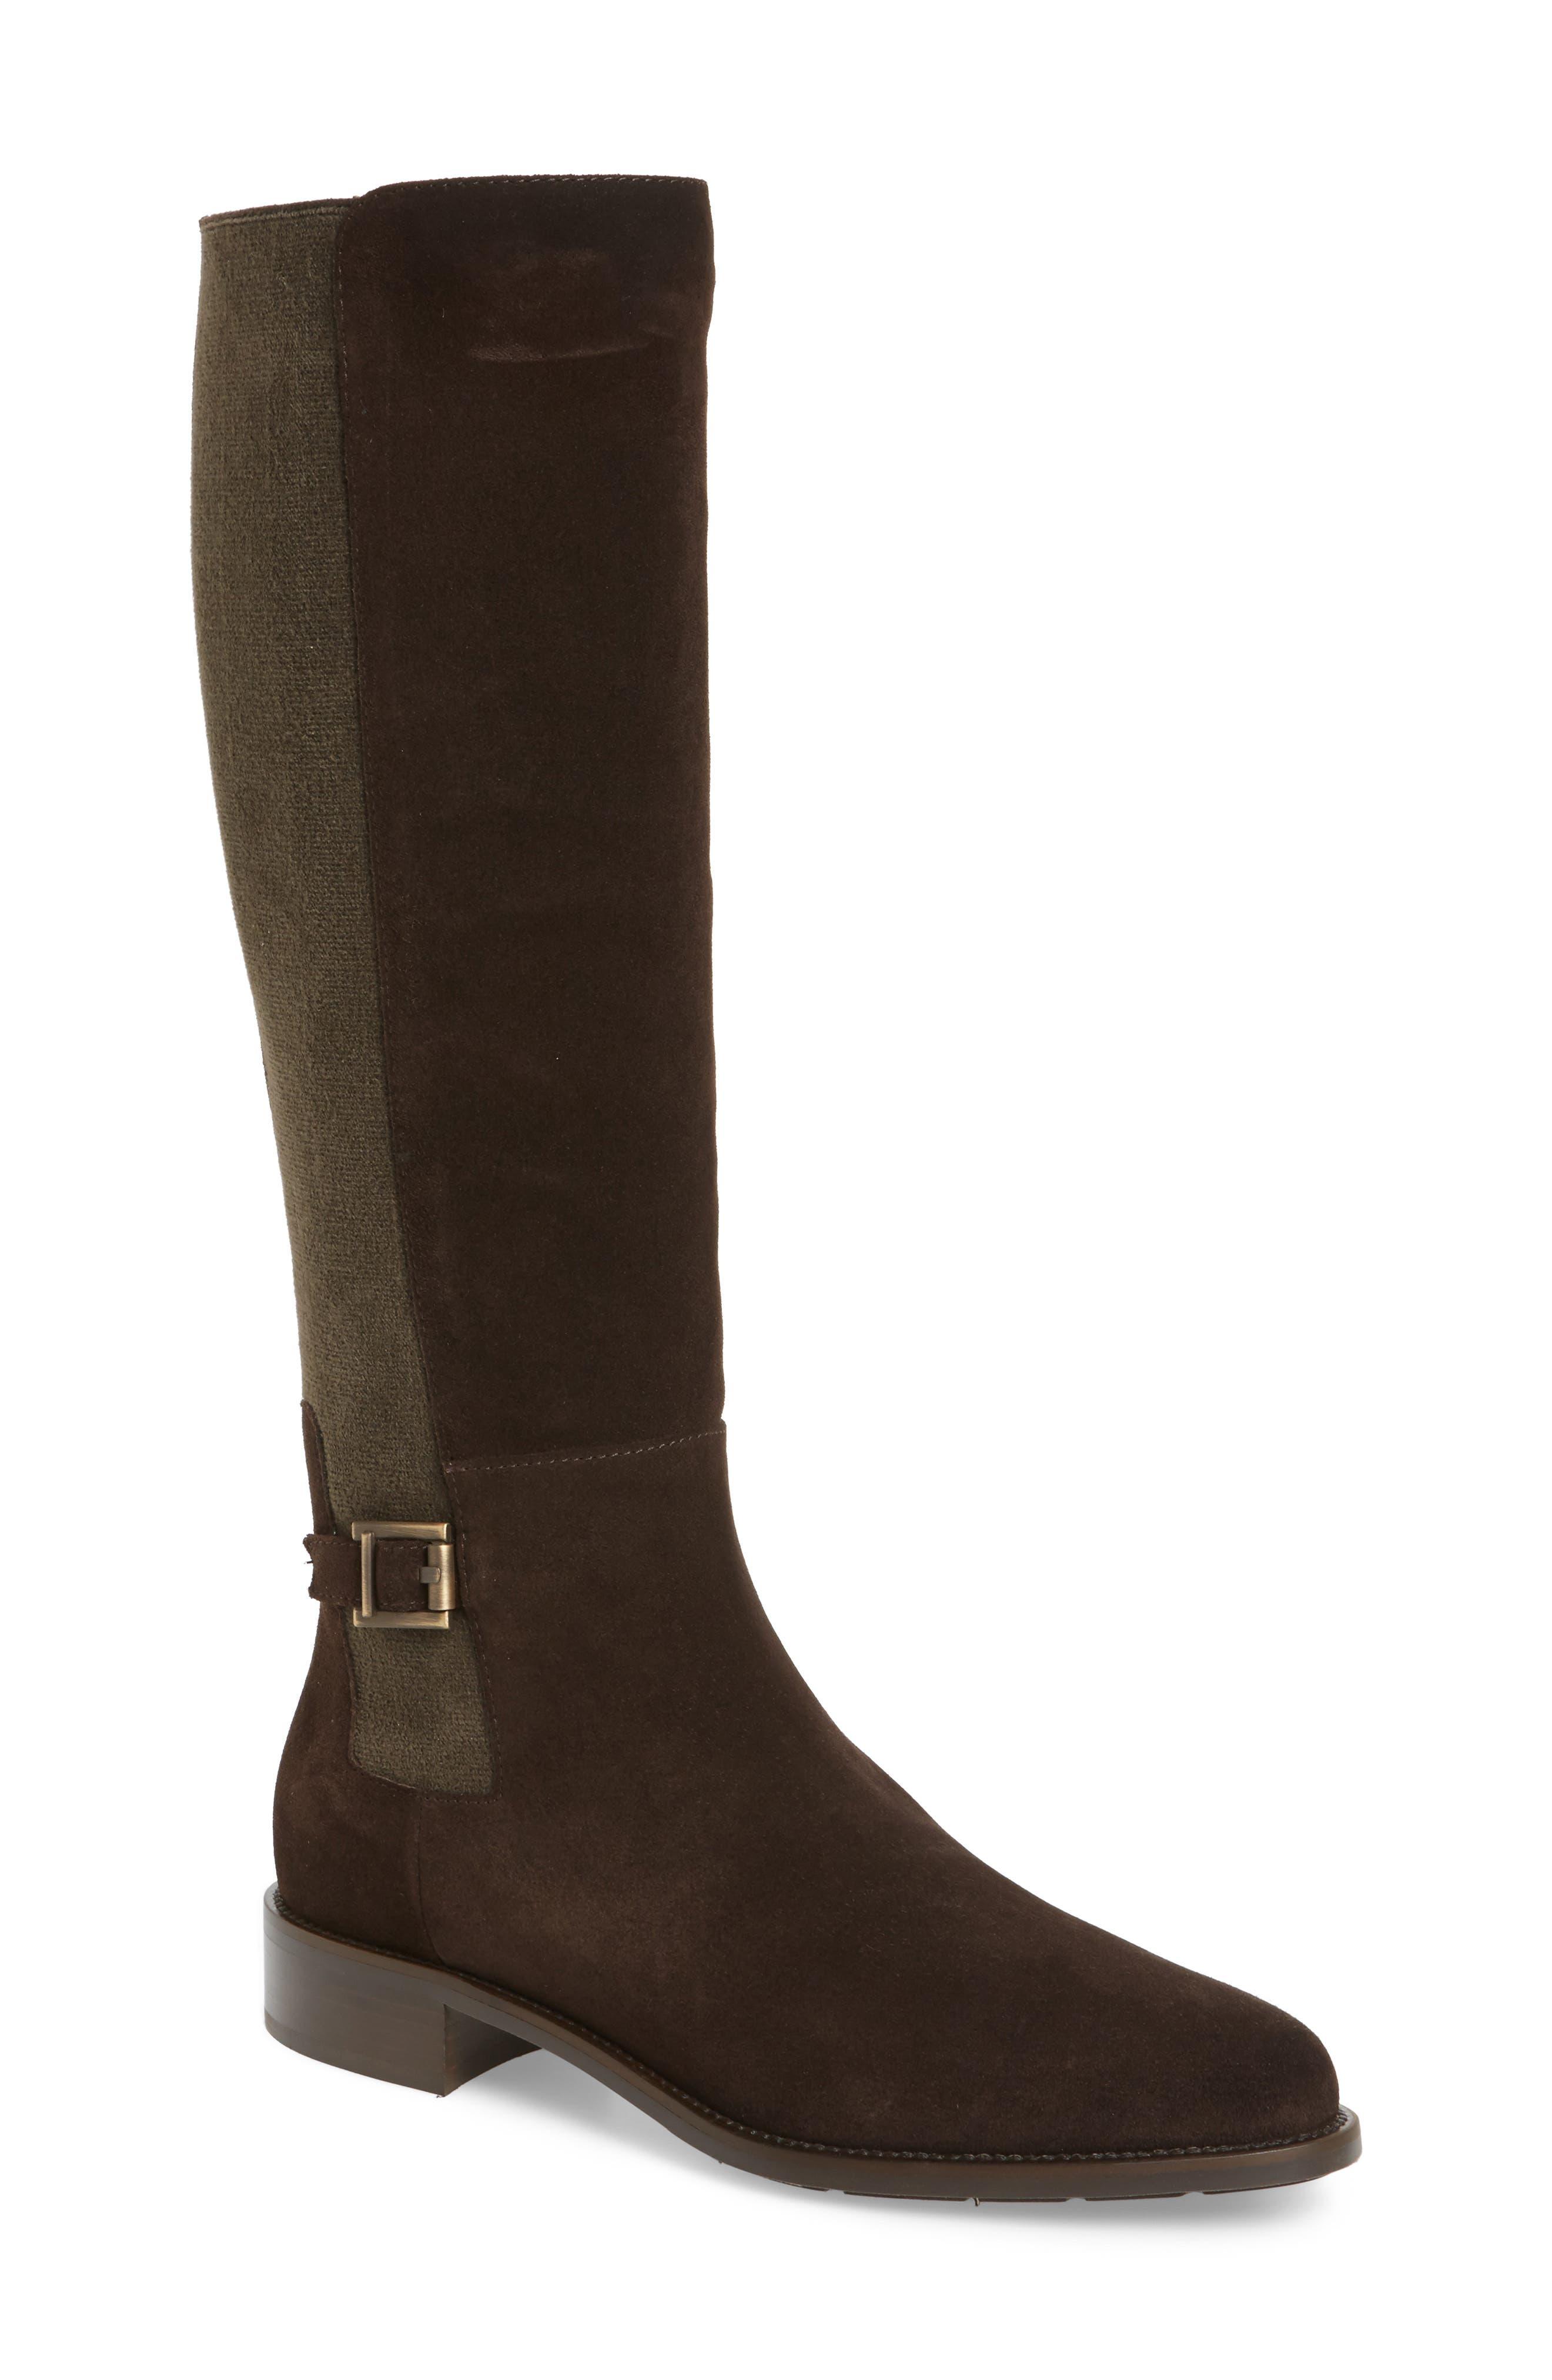 Alternate Image 1 Selected - Aquatalia Noella Weatherproof Tall Boot (Women)